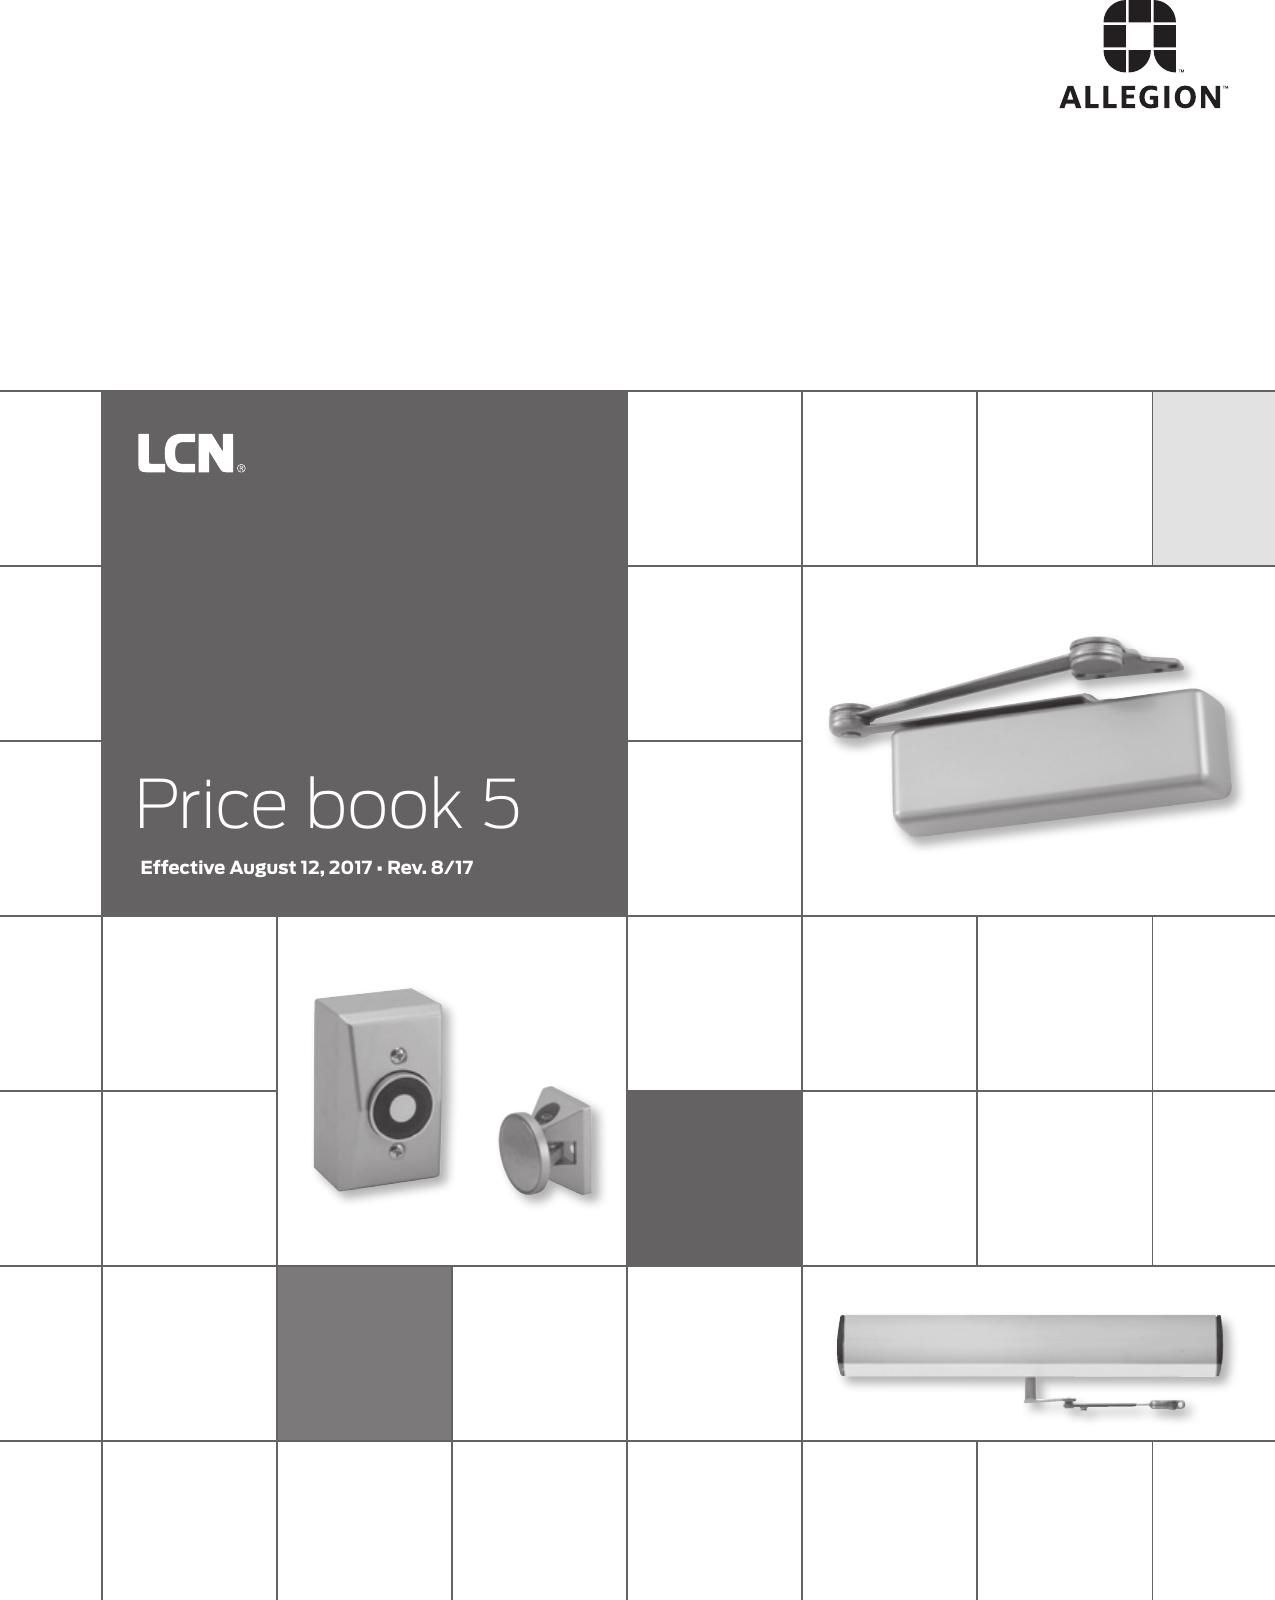 LCN 8310-852TWP Wall Mounted Wireless Actuator 6 Diameter 6 ...